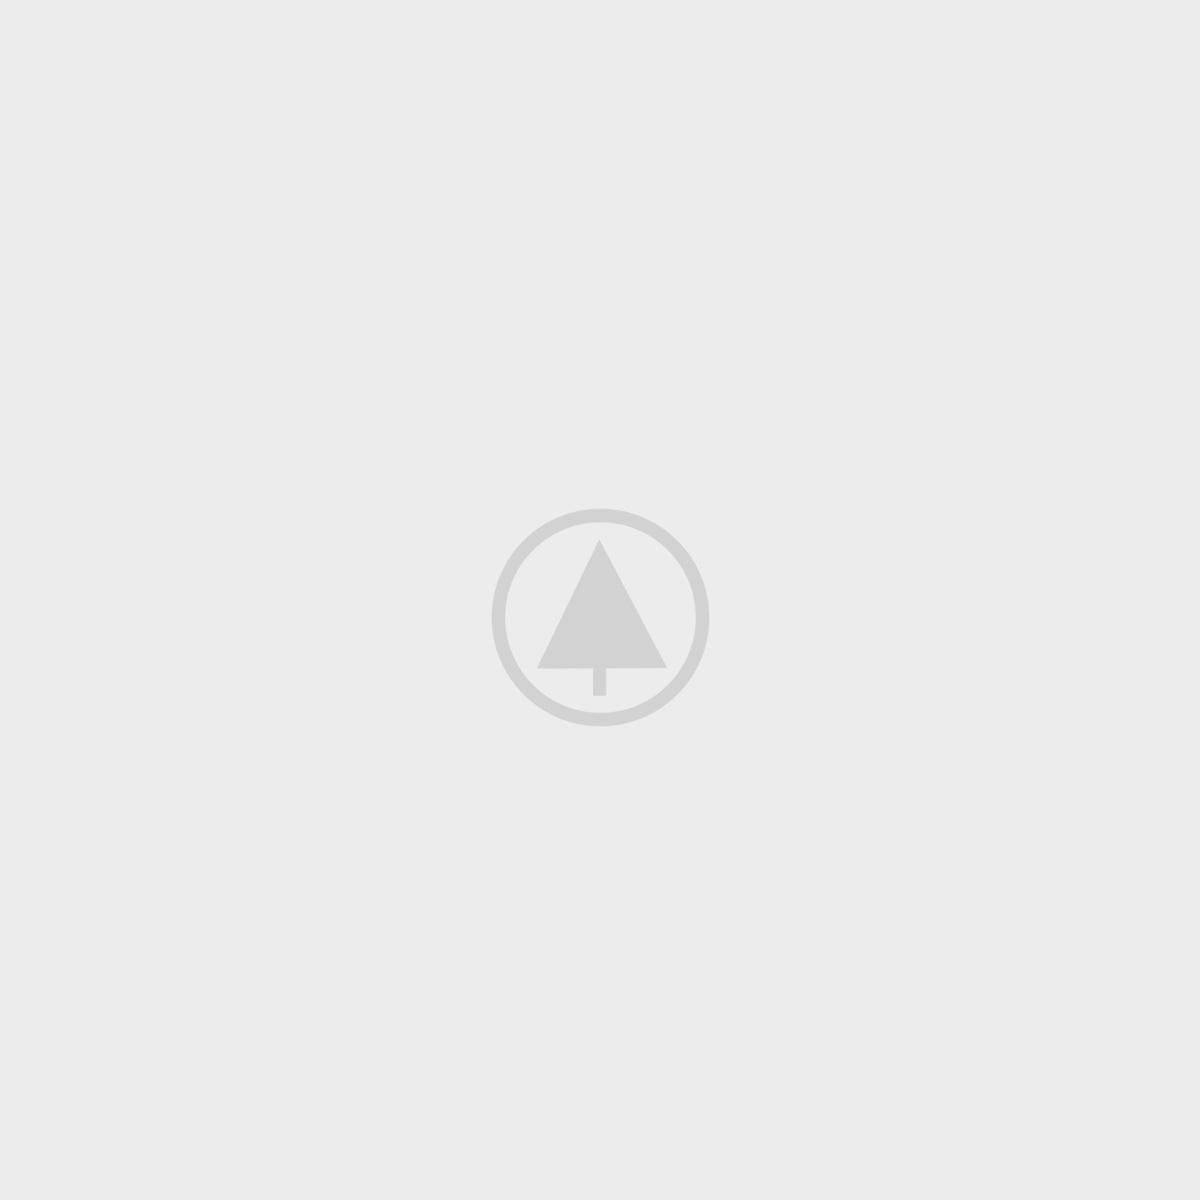 wood portfolio placeholder - - Con Murphys Menswear